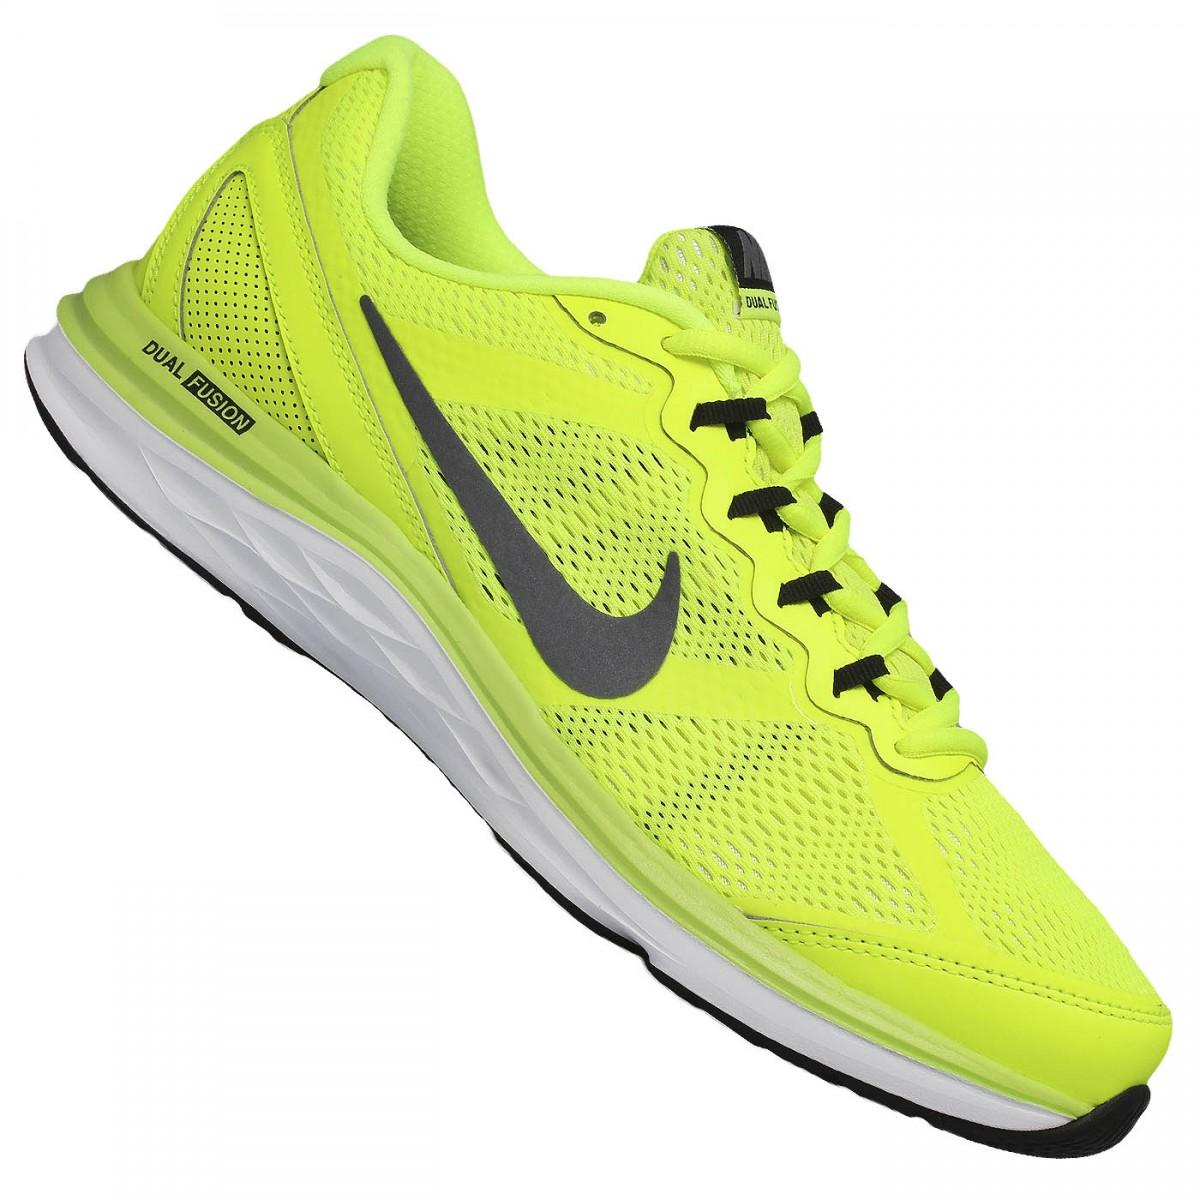 8d7dd8a8f50 Tênis Nike Dual Fusion Run 3